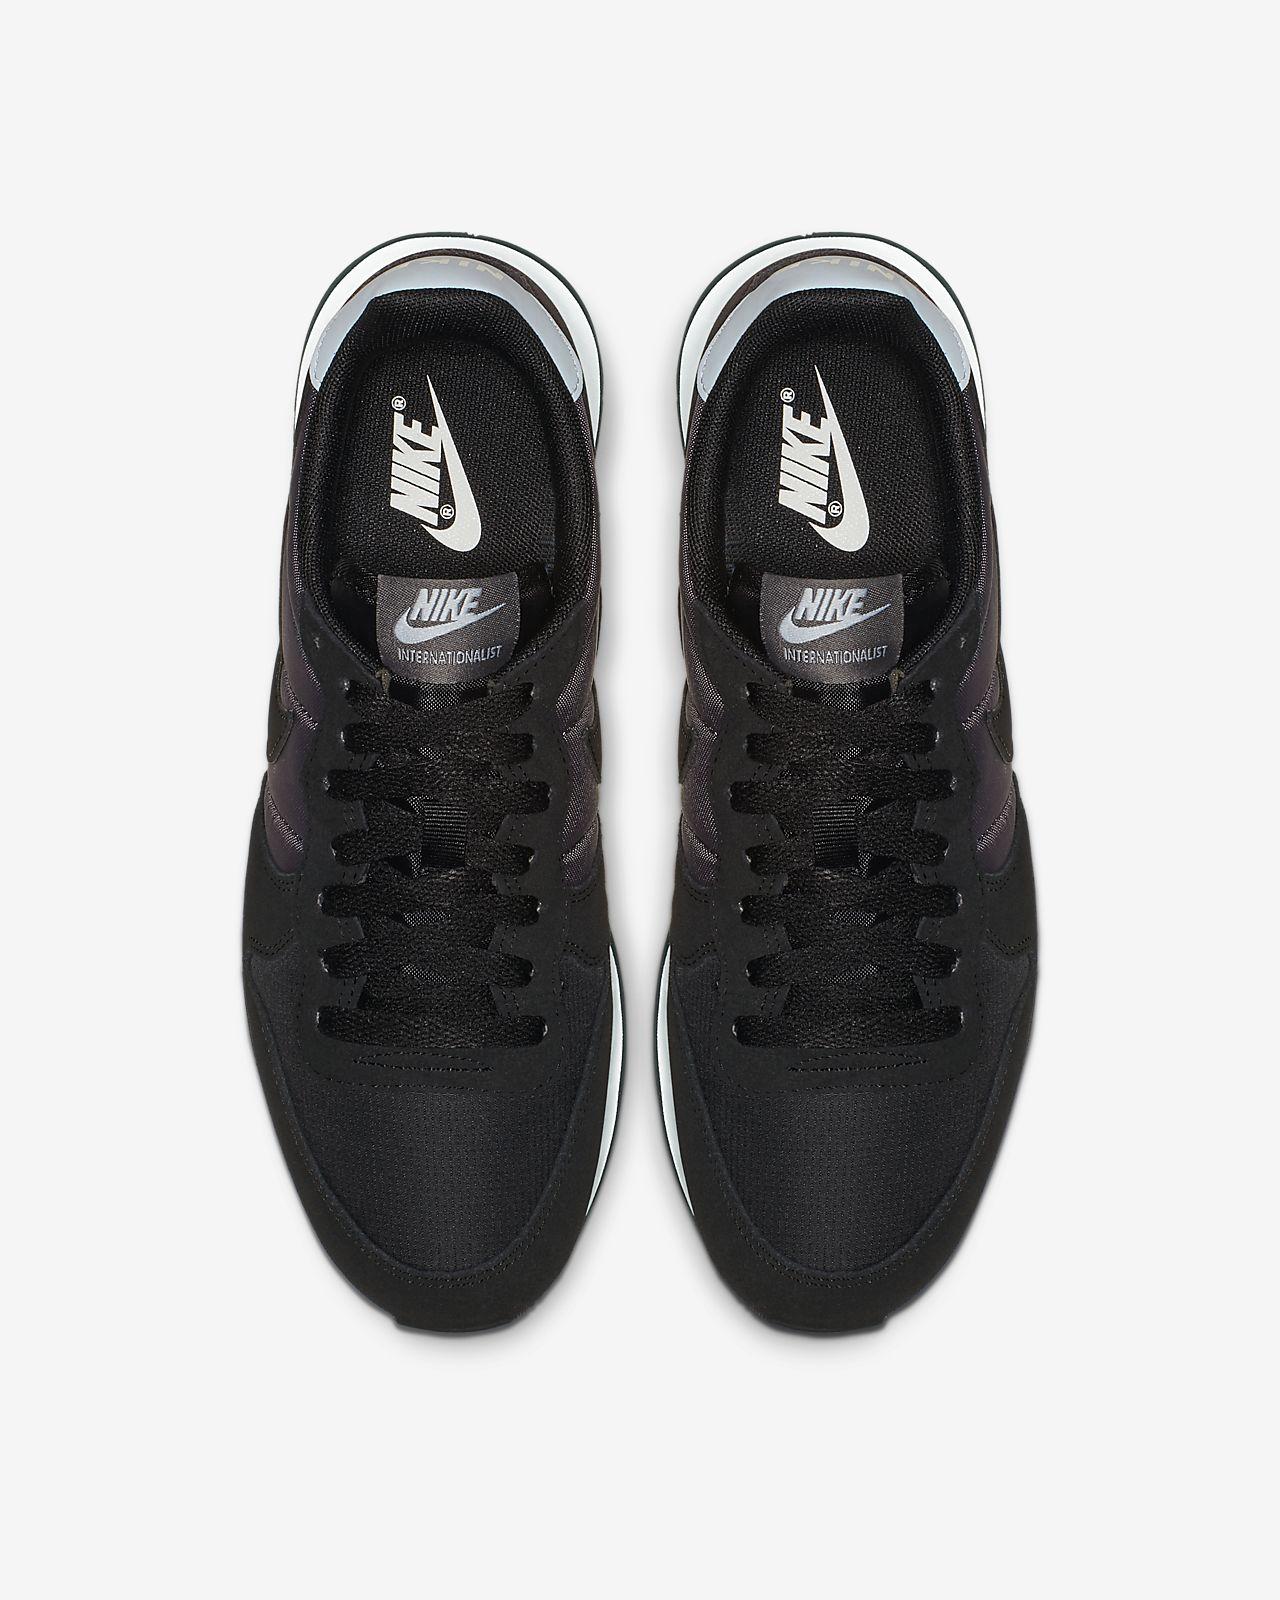 8475421ca6f0 Low Resolution Nike Internationalist Women s Shoe Nike Internationalist  Women s Shoe